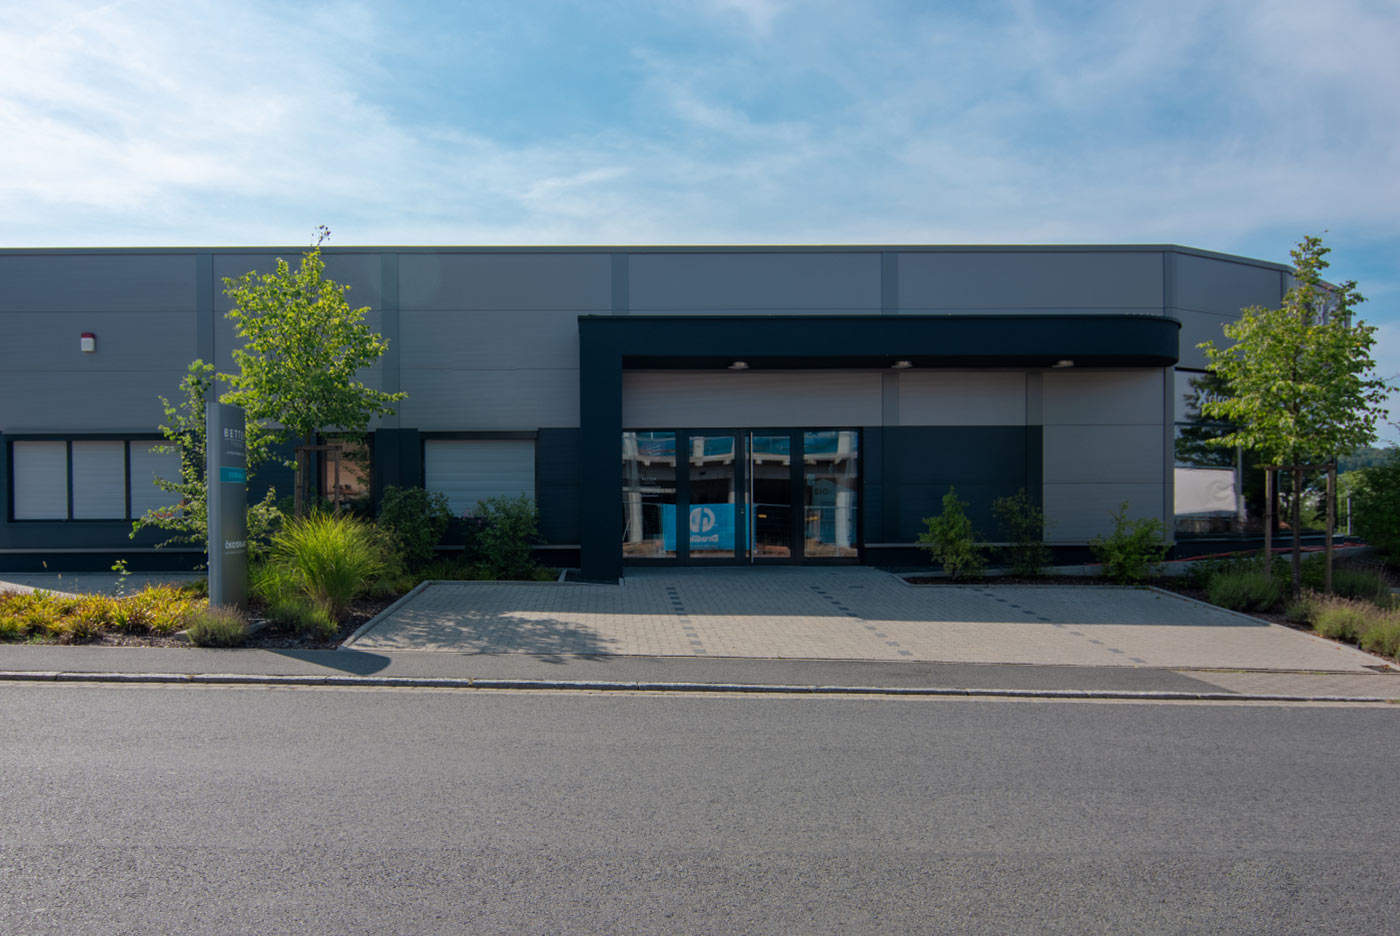 Firmengebäude, Büros, Logistik, Logistiklager, Lagerhallen